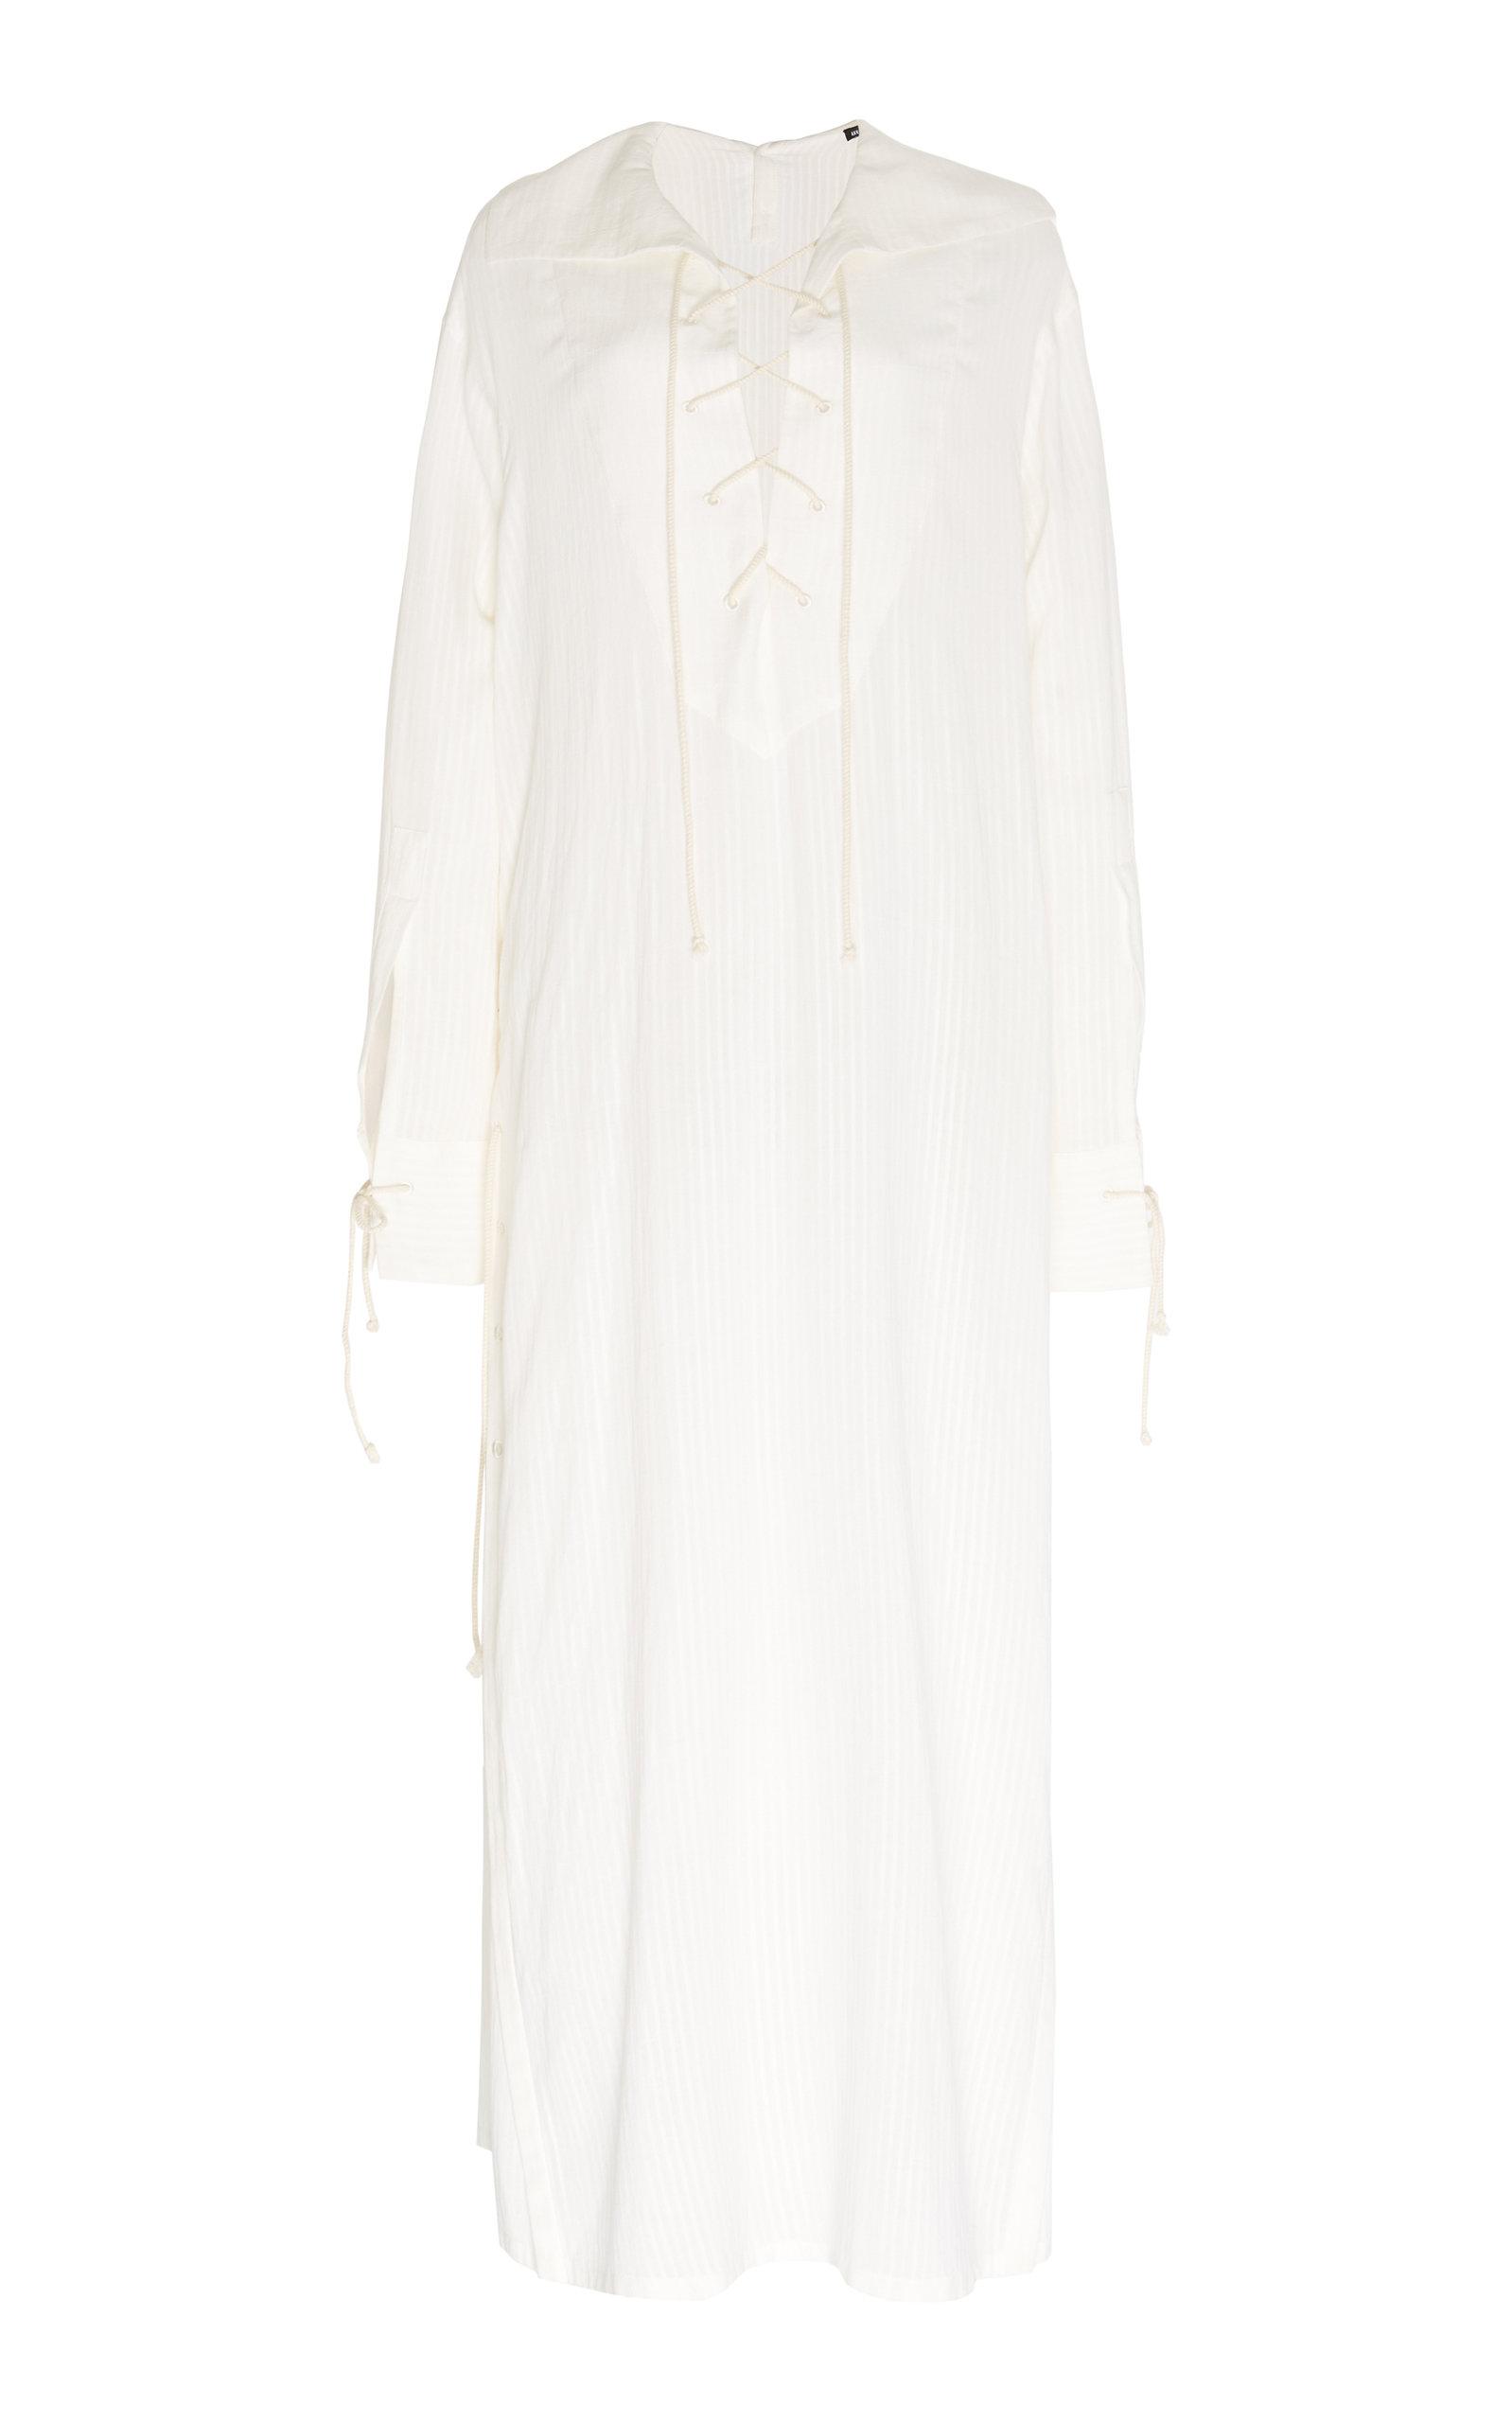 Buy Ann Demeulemeester Lace-Up Cotton-Blend Shirt Dress online, shop Ann Demeulemeester at the best price